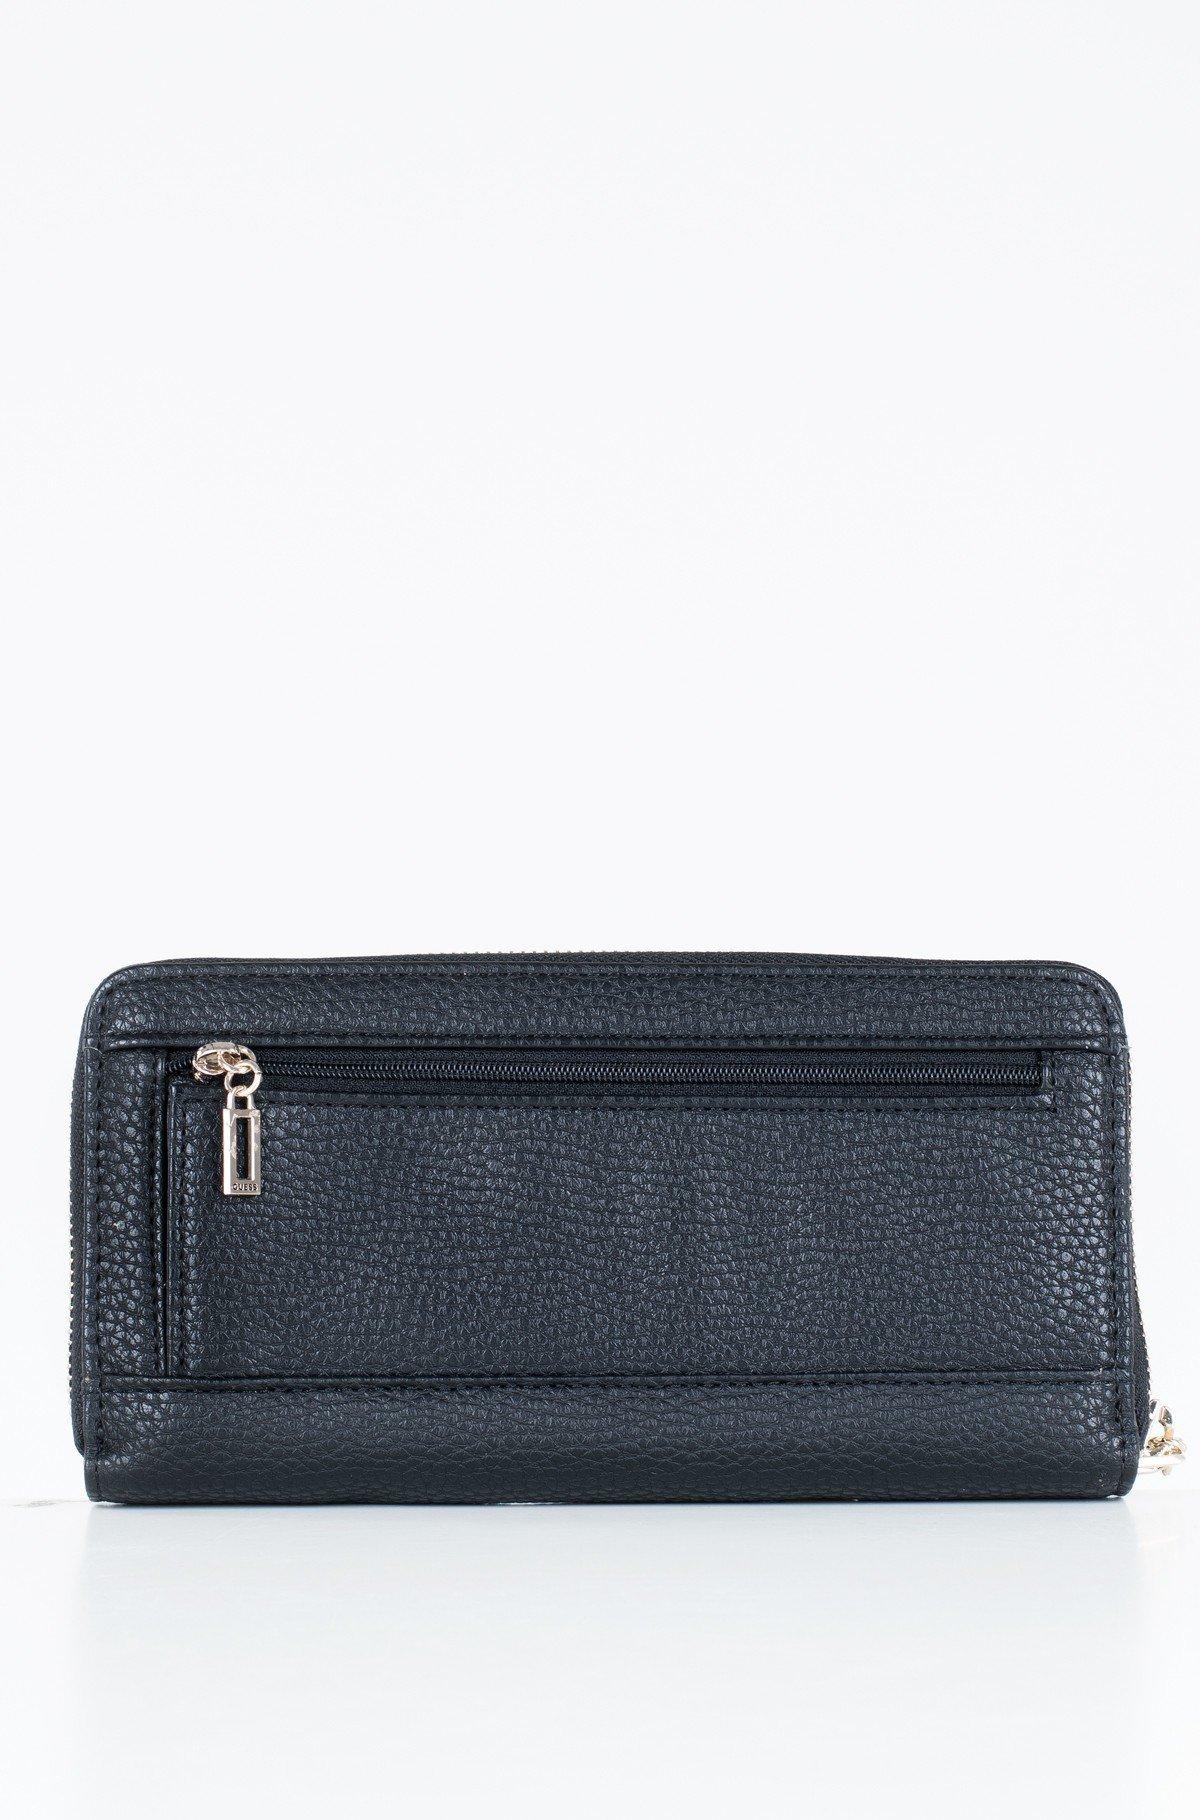 Wallet SWVG74 39460-full-2